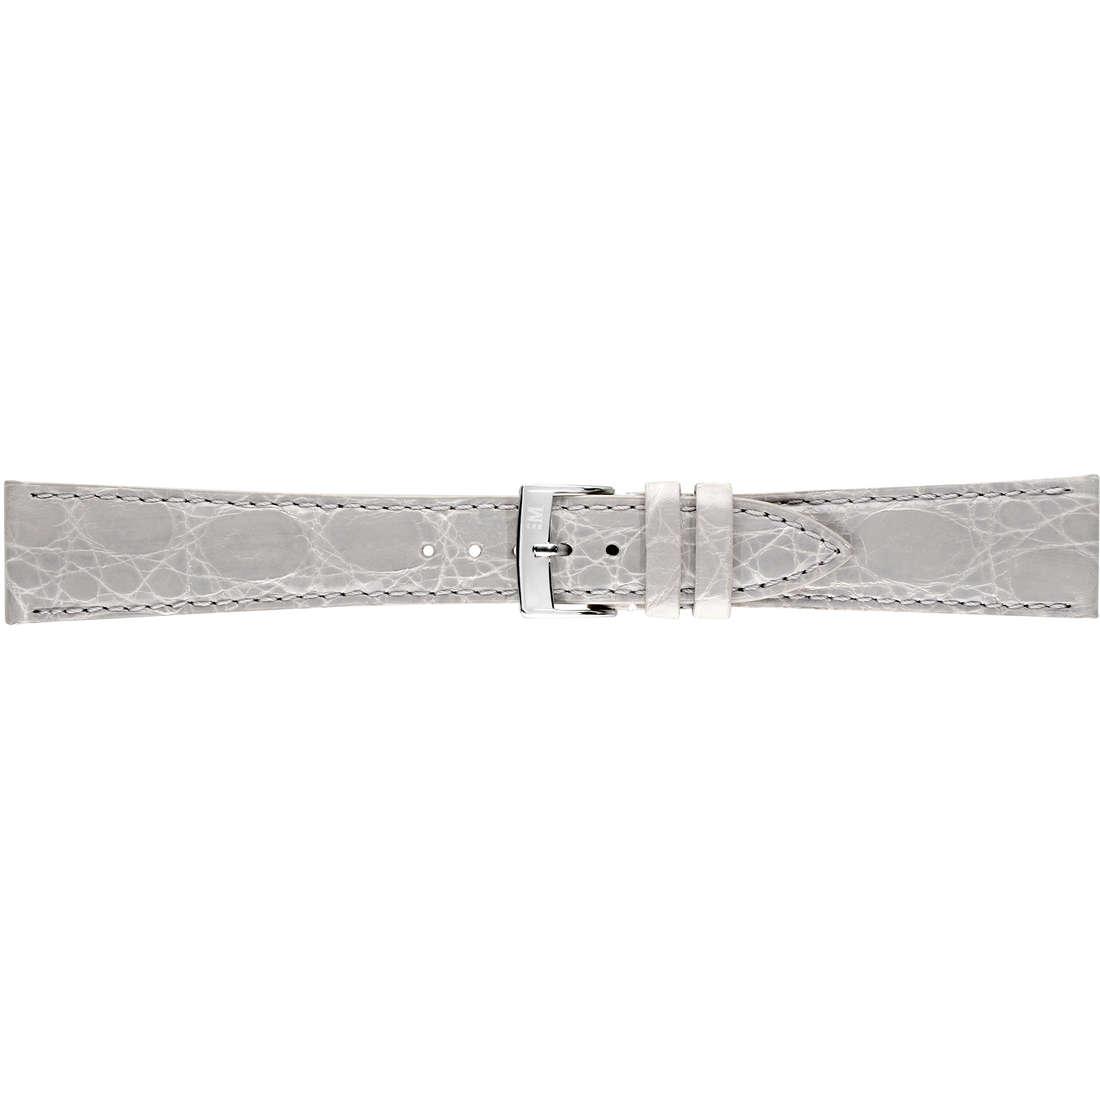 watch watch bands watch straps man Morellato Pelli Preziose A01X2197052093CR12